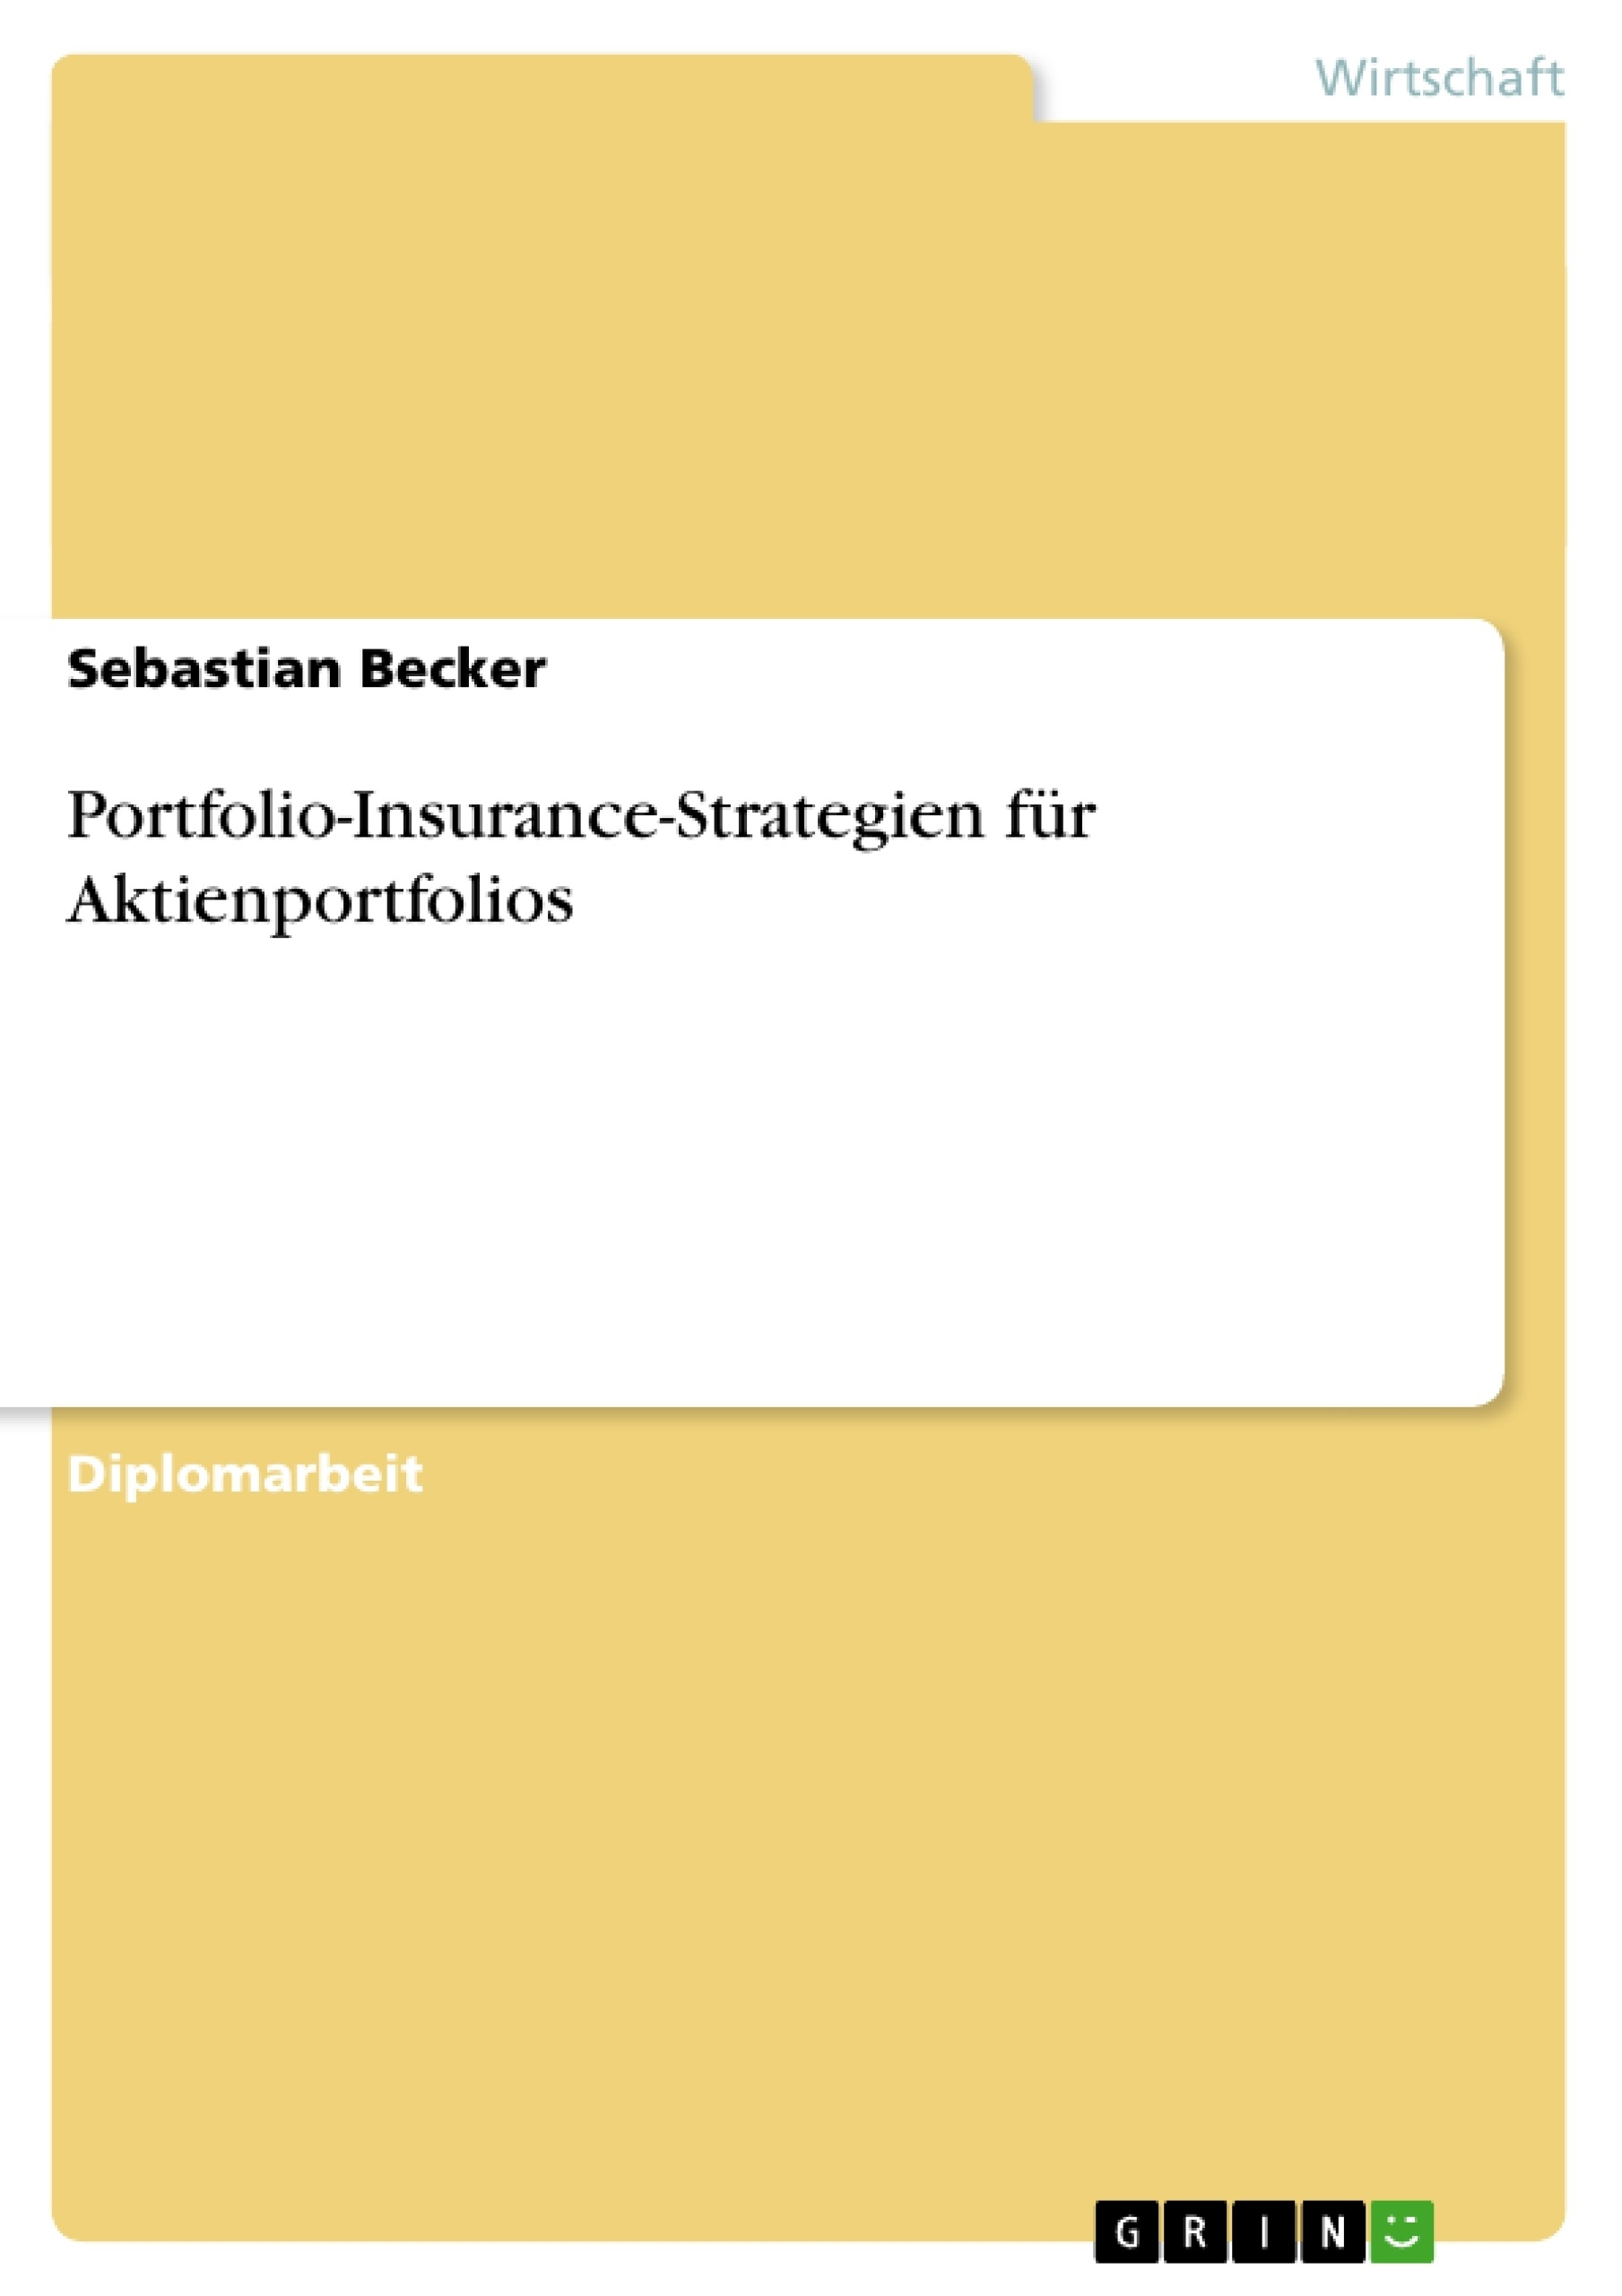 Titel: Portfolio-Insurance-Strategien für Aktienportfolios